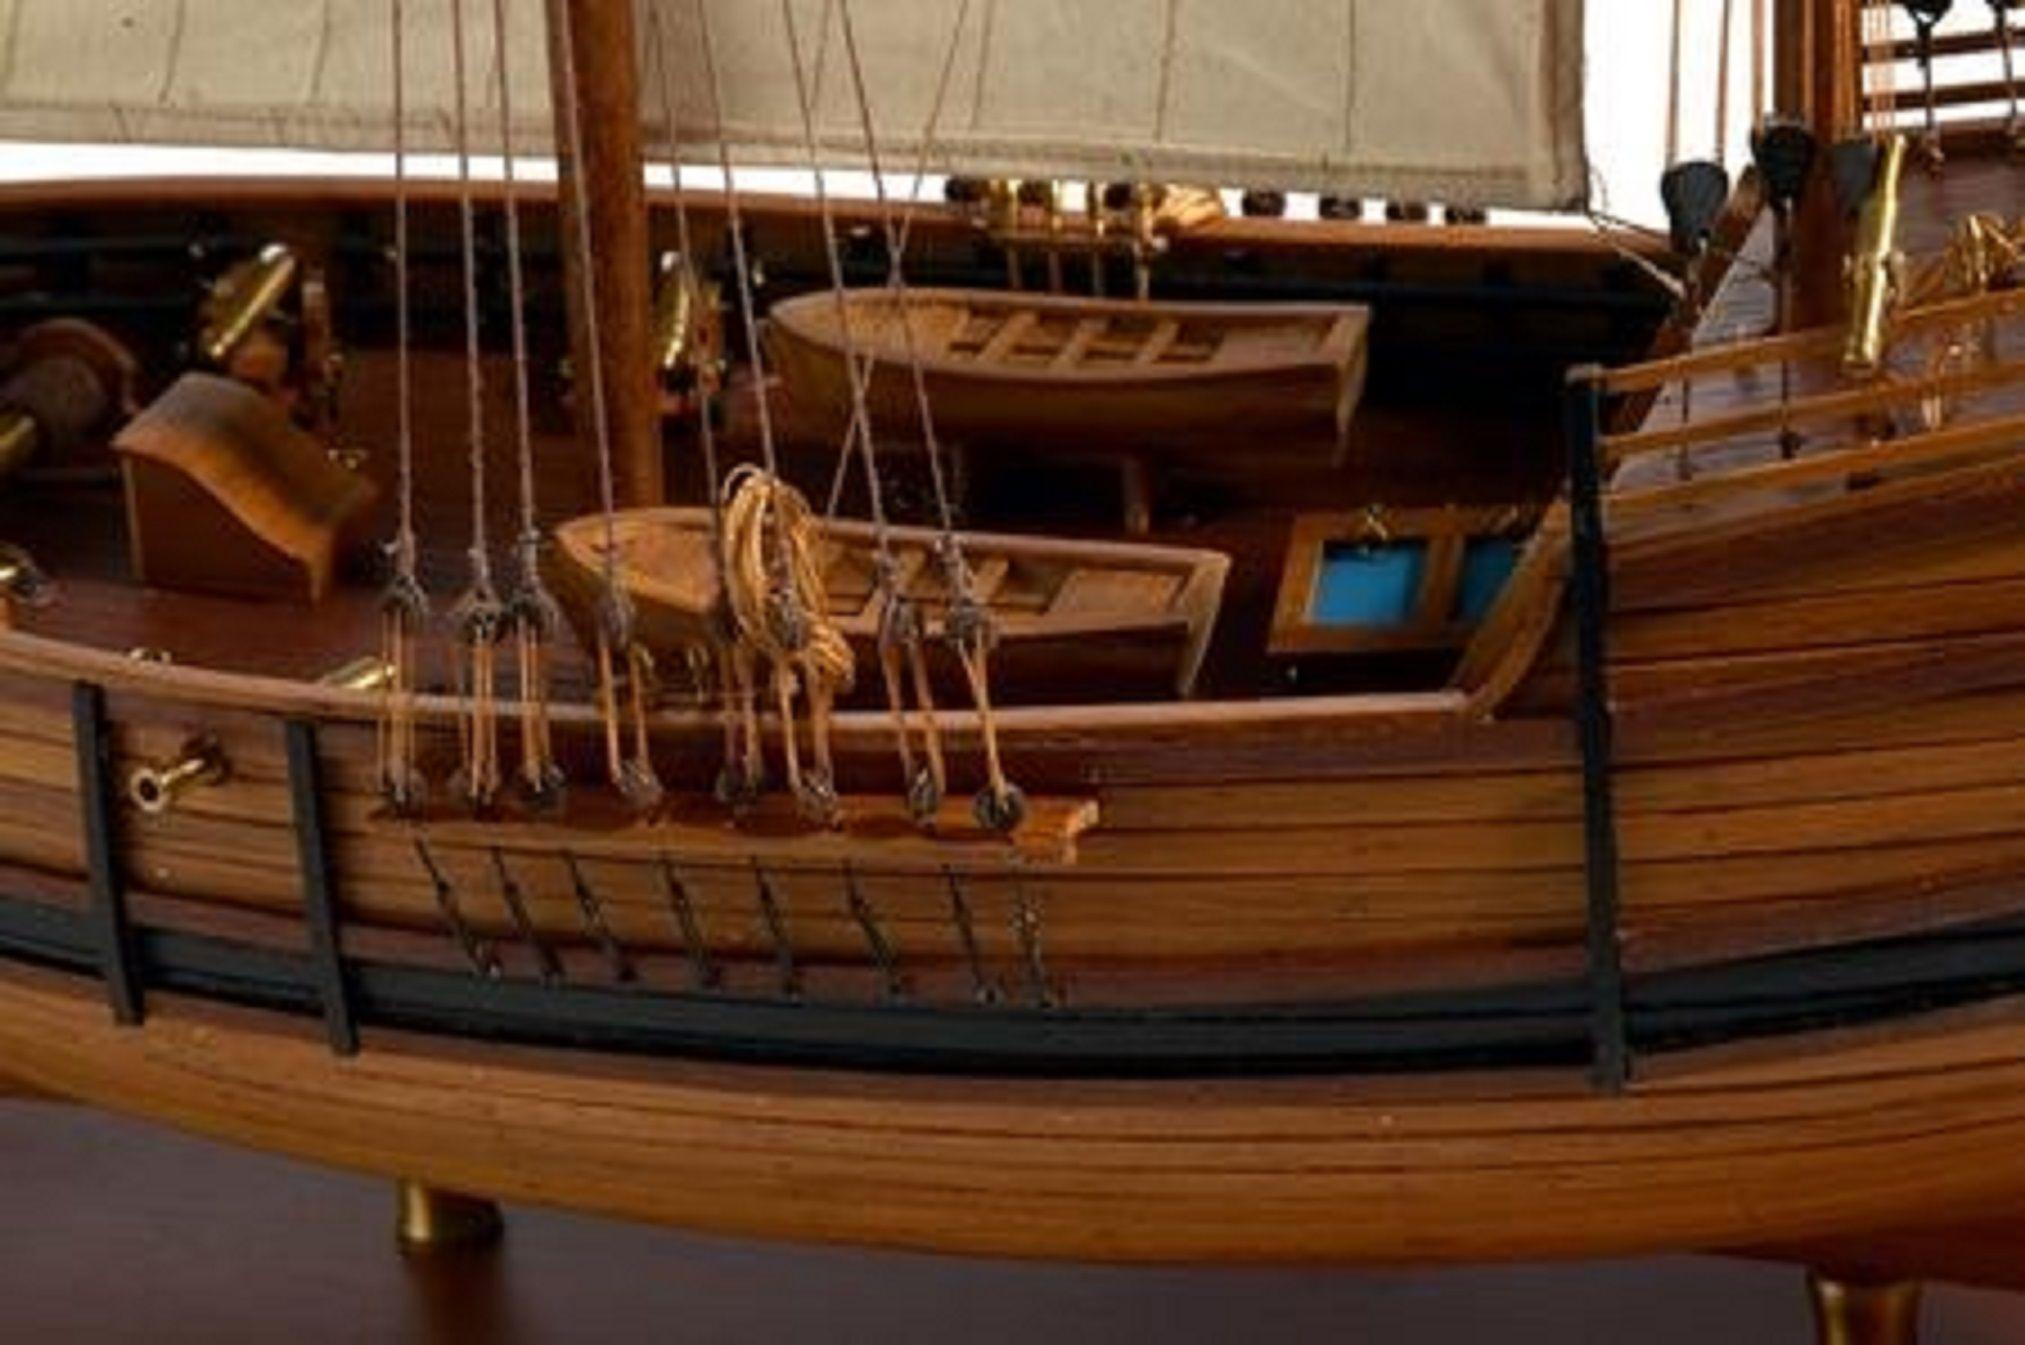 217-7200-Caravel-model-ship-Premier-Range